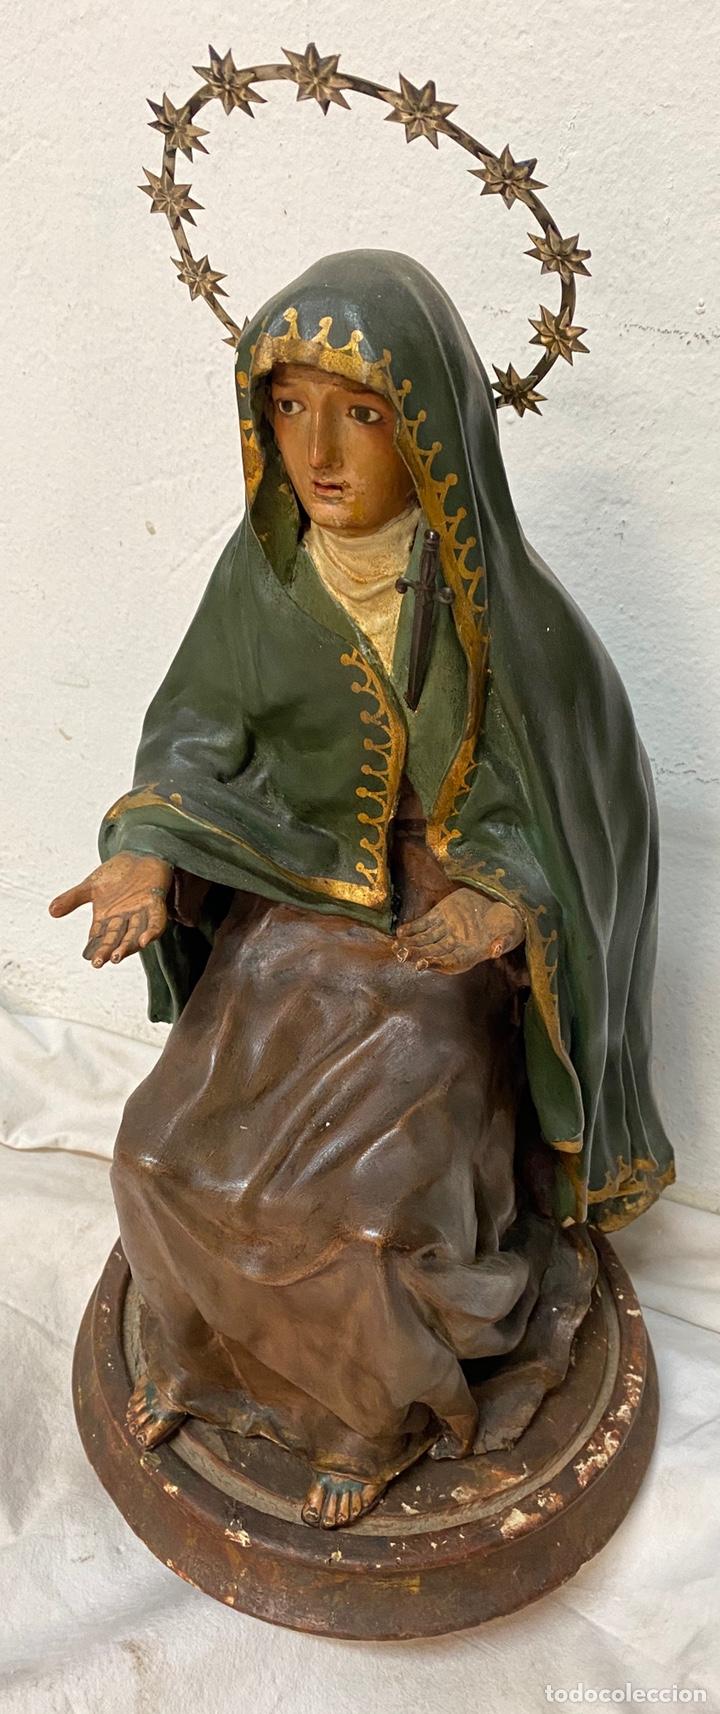 ANTIGUA CAP I POTA ESPECIAL CON CORONA Y ESPADA DE PLATA. TELAS ENCOLADA. VIRGEN.53 CM ALTO.DOLOROSA (Arte - Arte Religioso - Escultura)